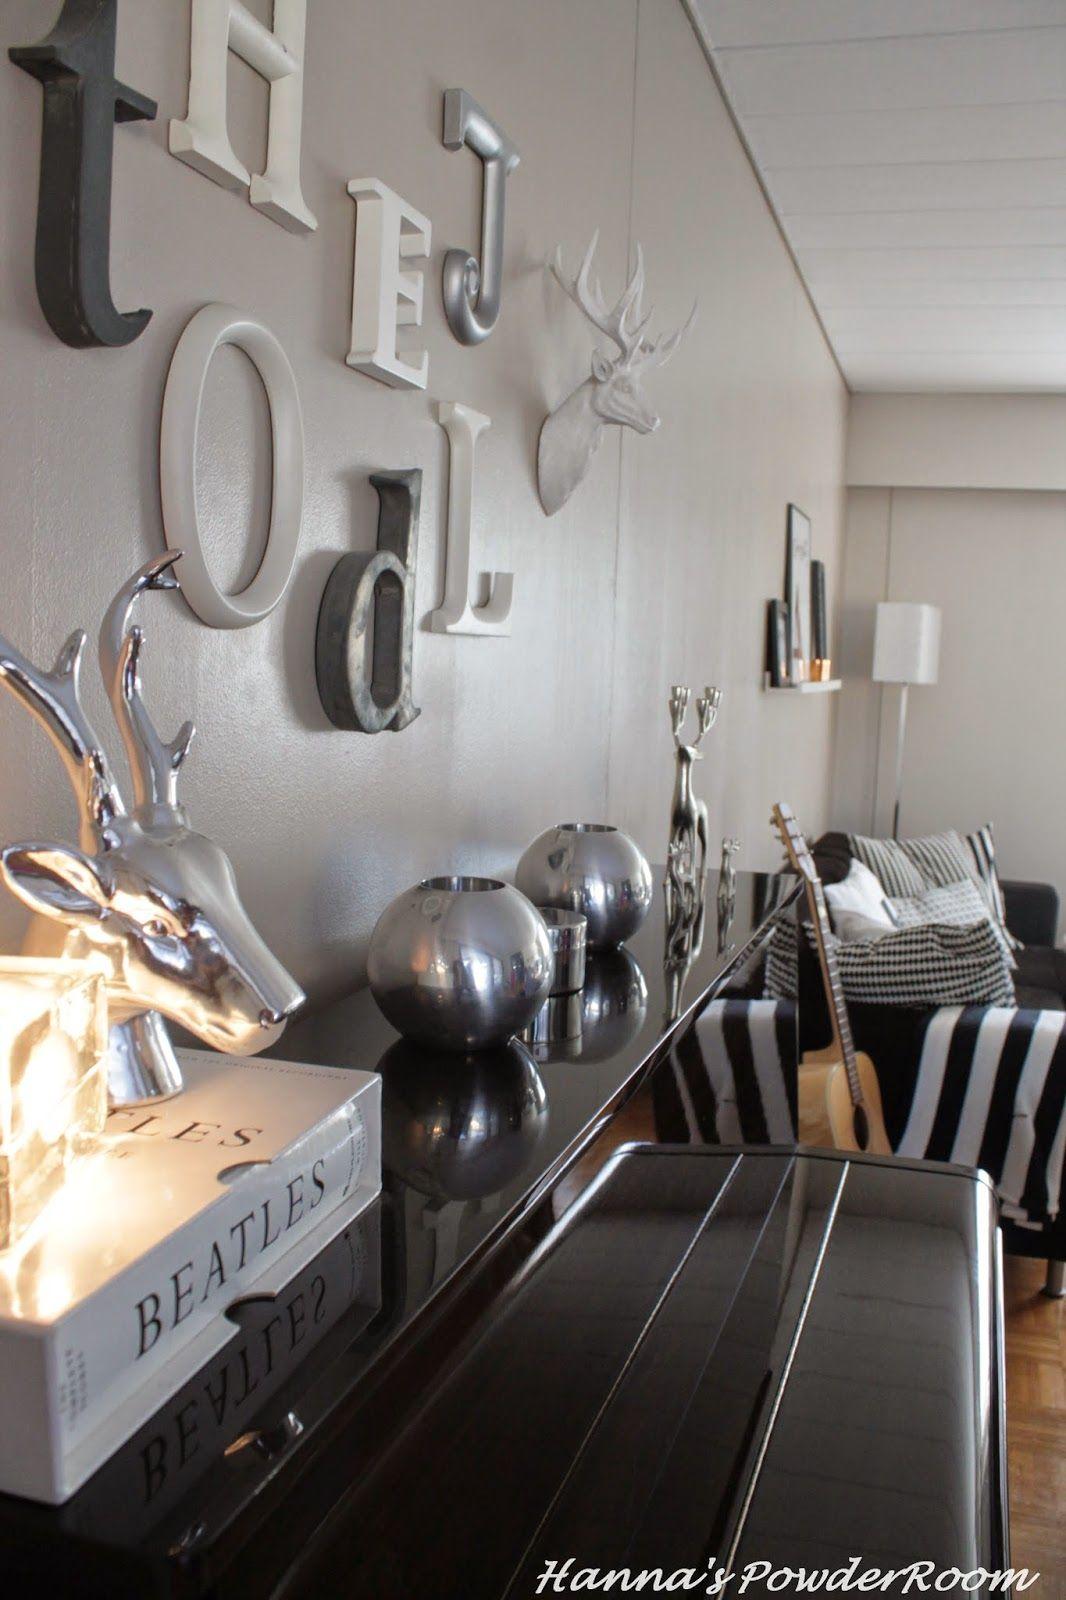 My livingroom Hanna's PowderRoom Blog